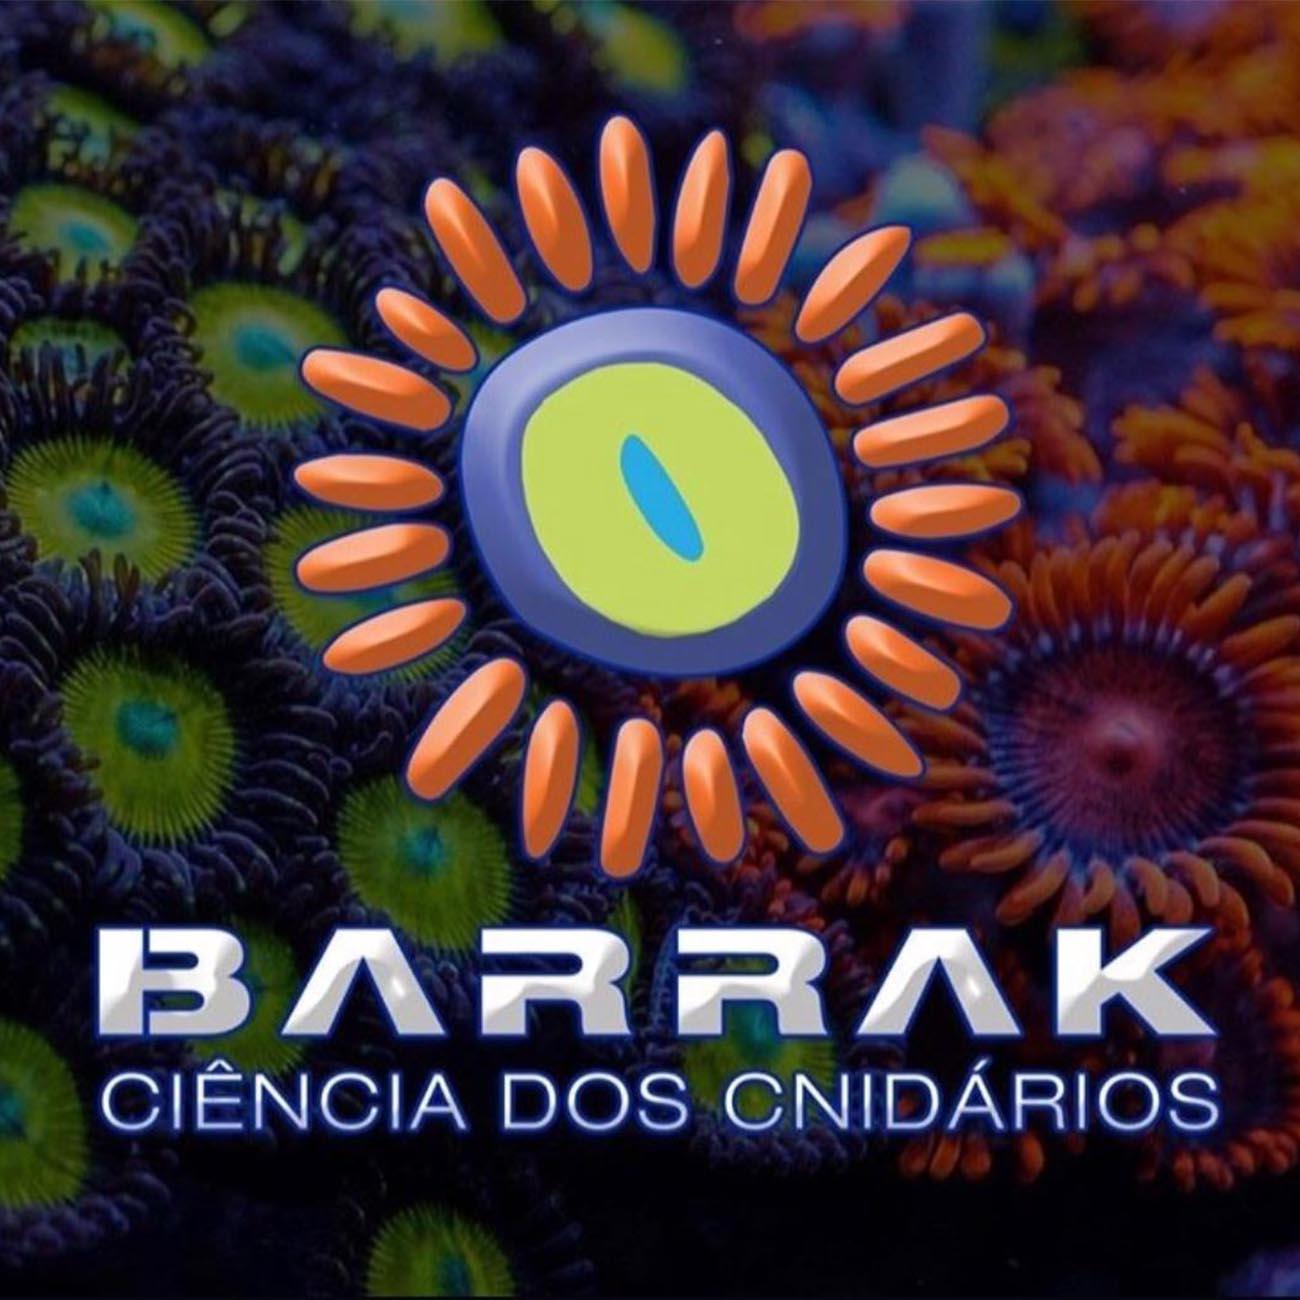 Bacter 2 Barrak Blend de Bacterias Desnitrificantes 400ml